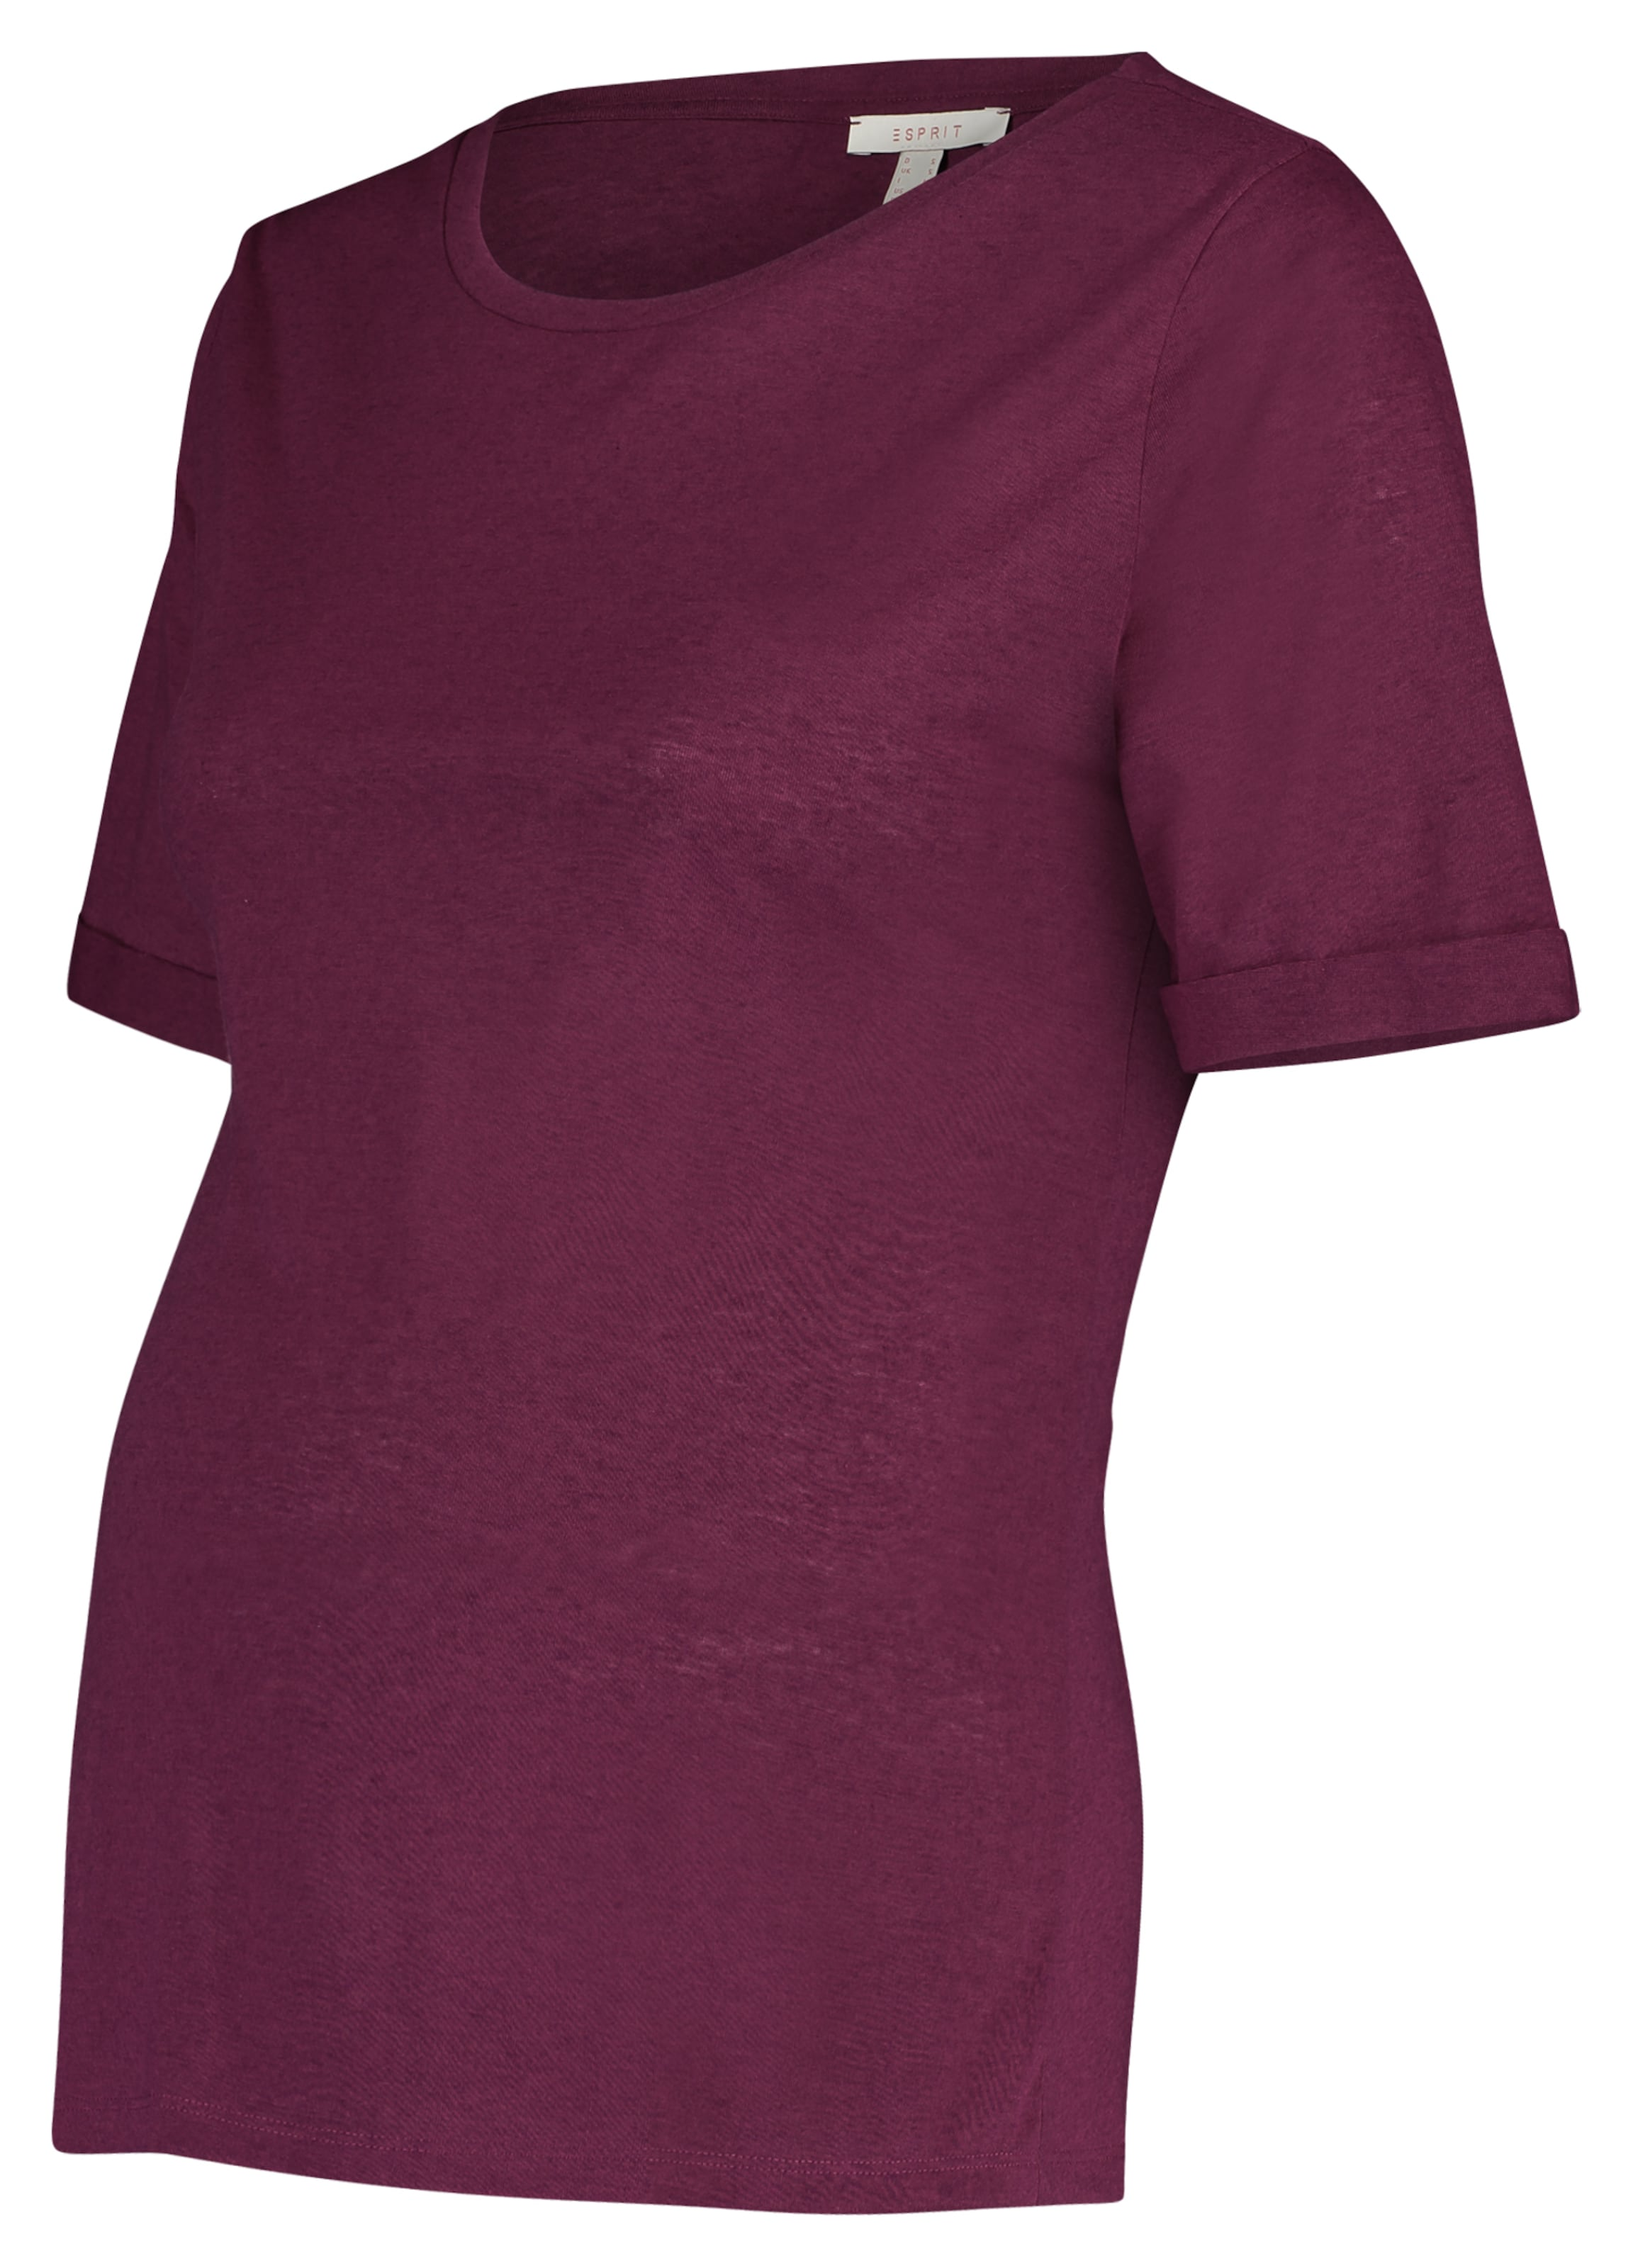 T In Esprit Beere Maternity shirt EDIY9HW2